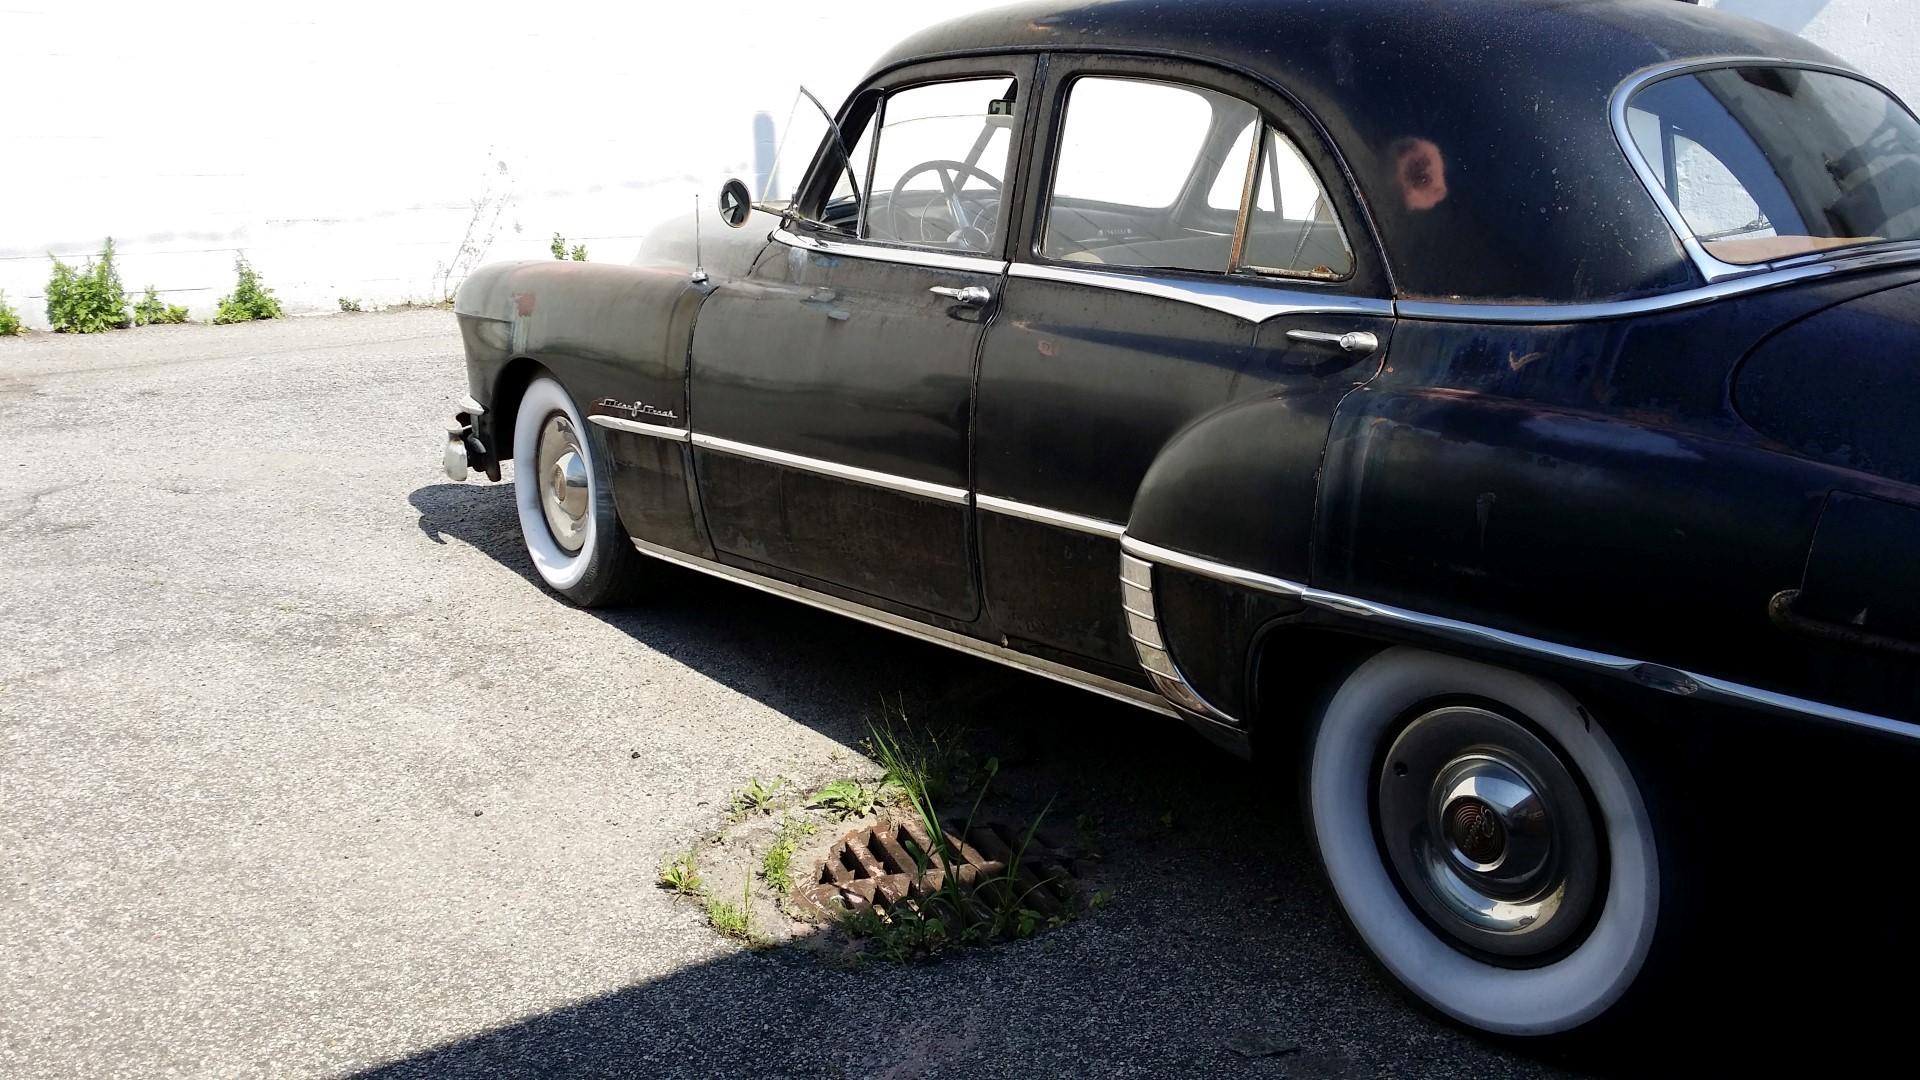 1950 Pontiac Chieftain Eight Deluxe Sedan (47)